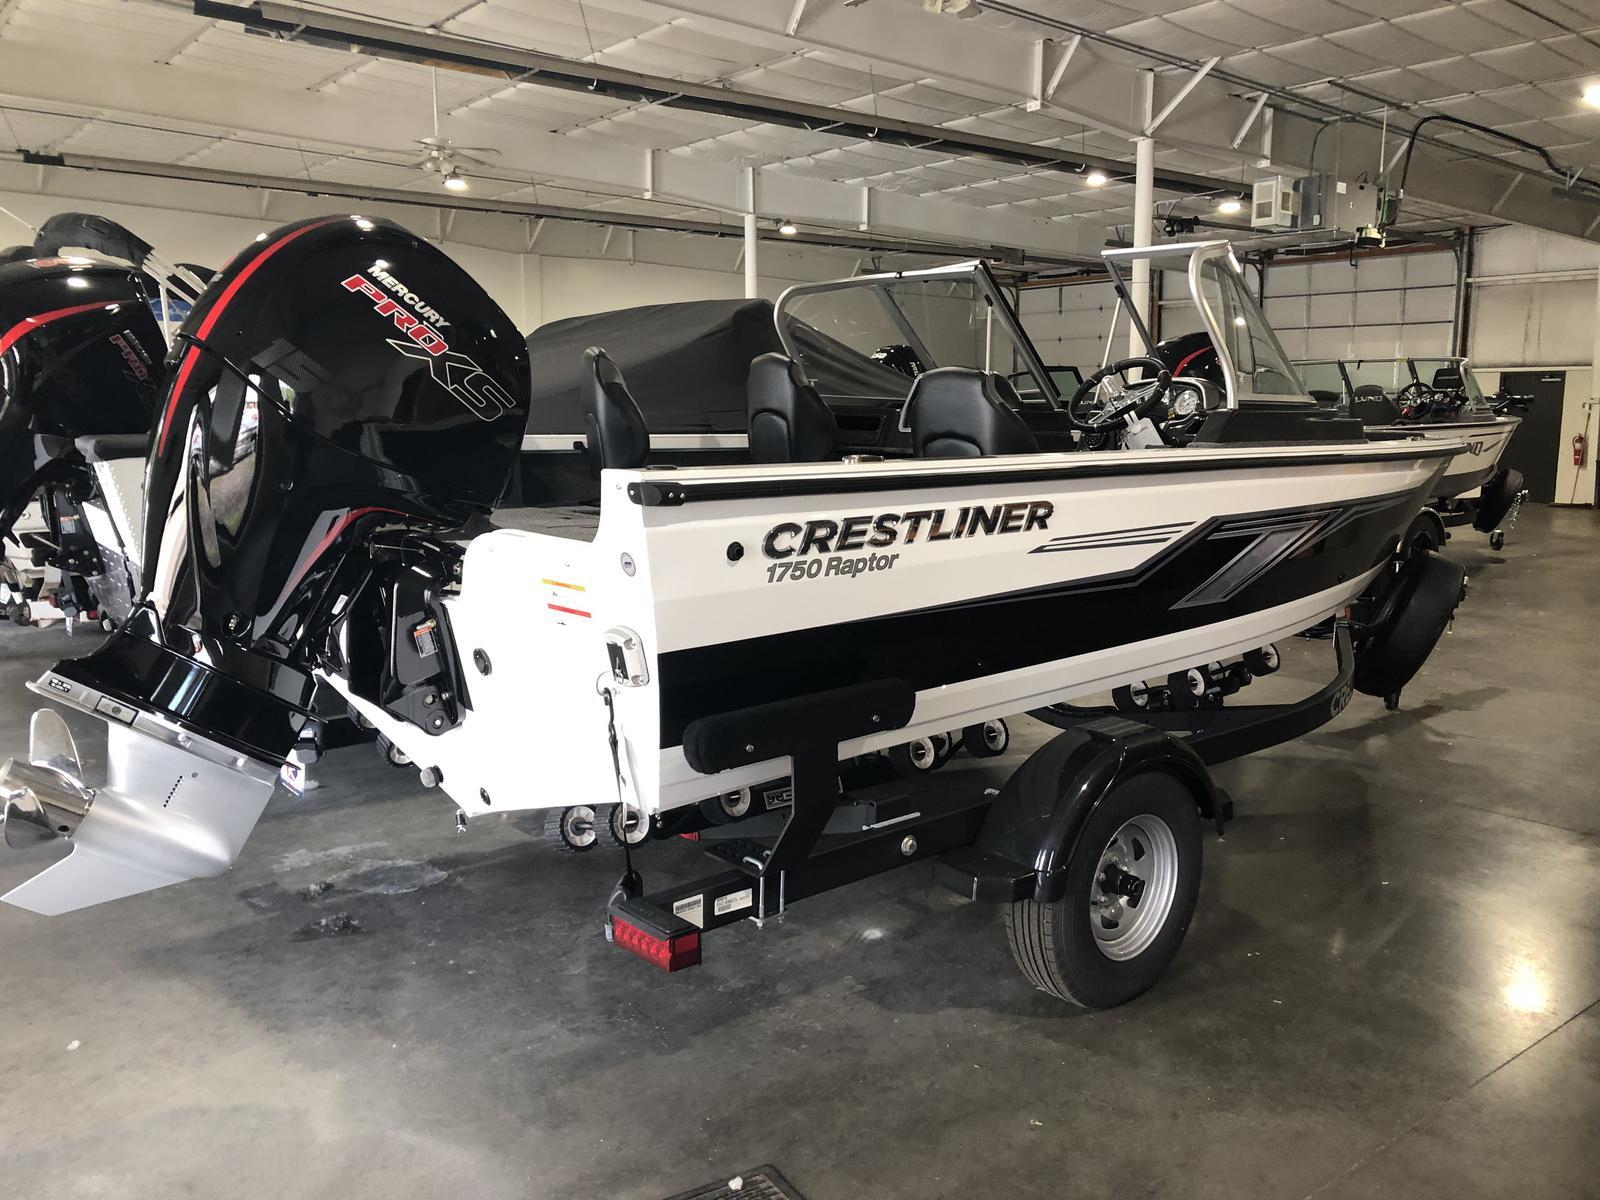 Inventory from Crestliner Rapid Marine